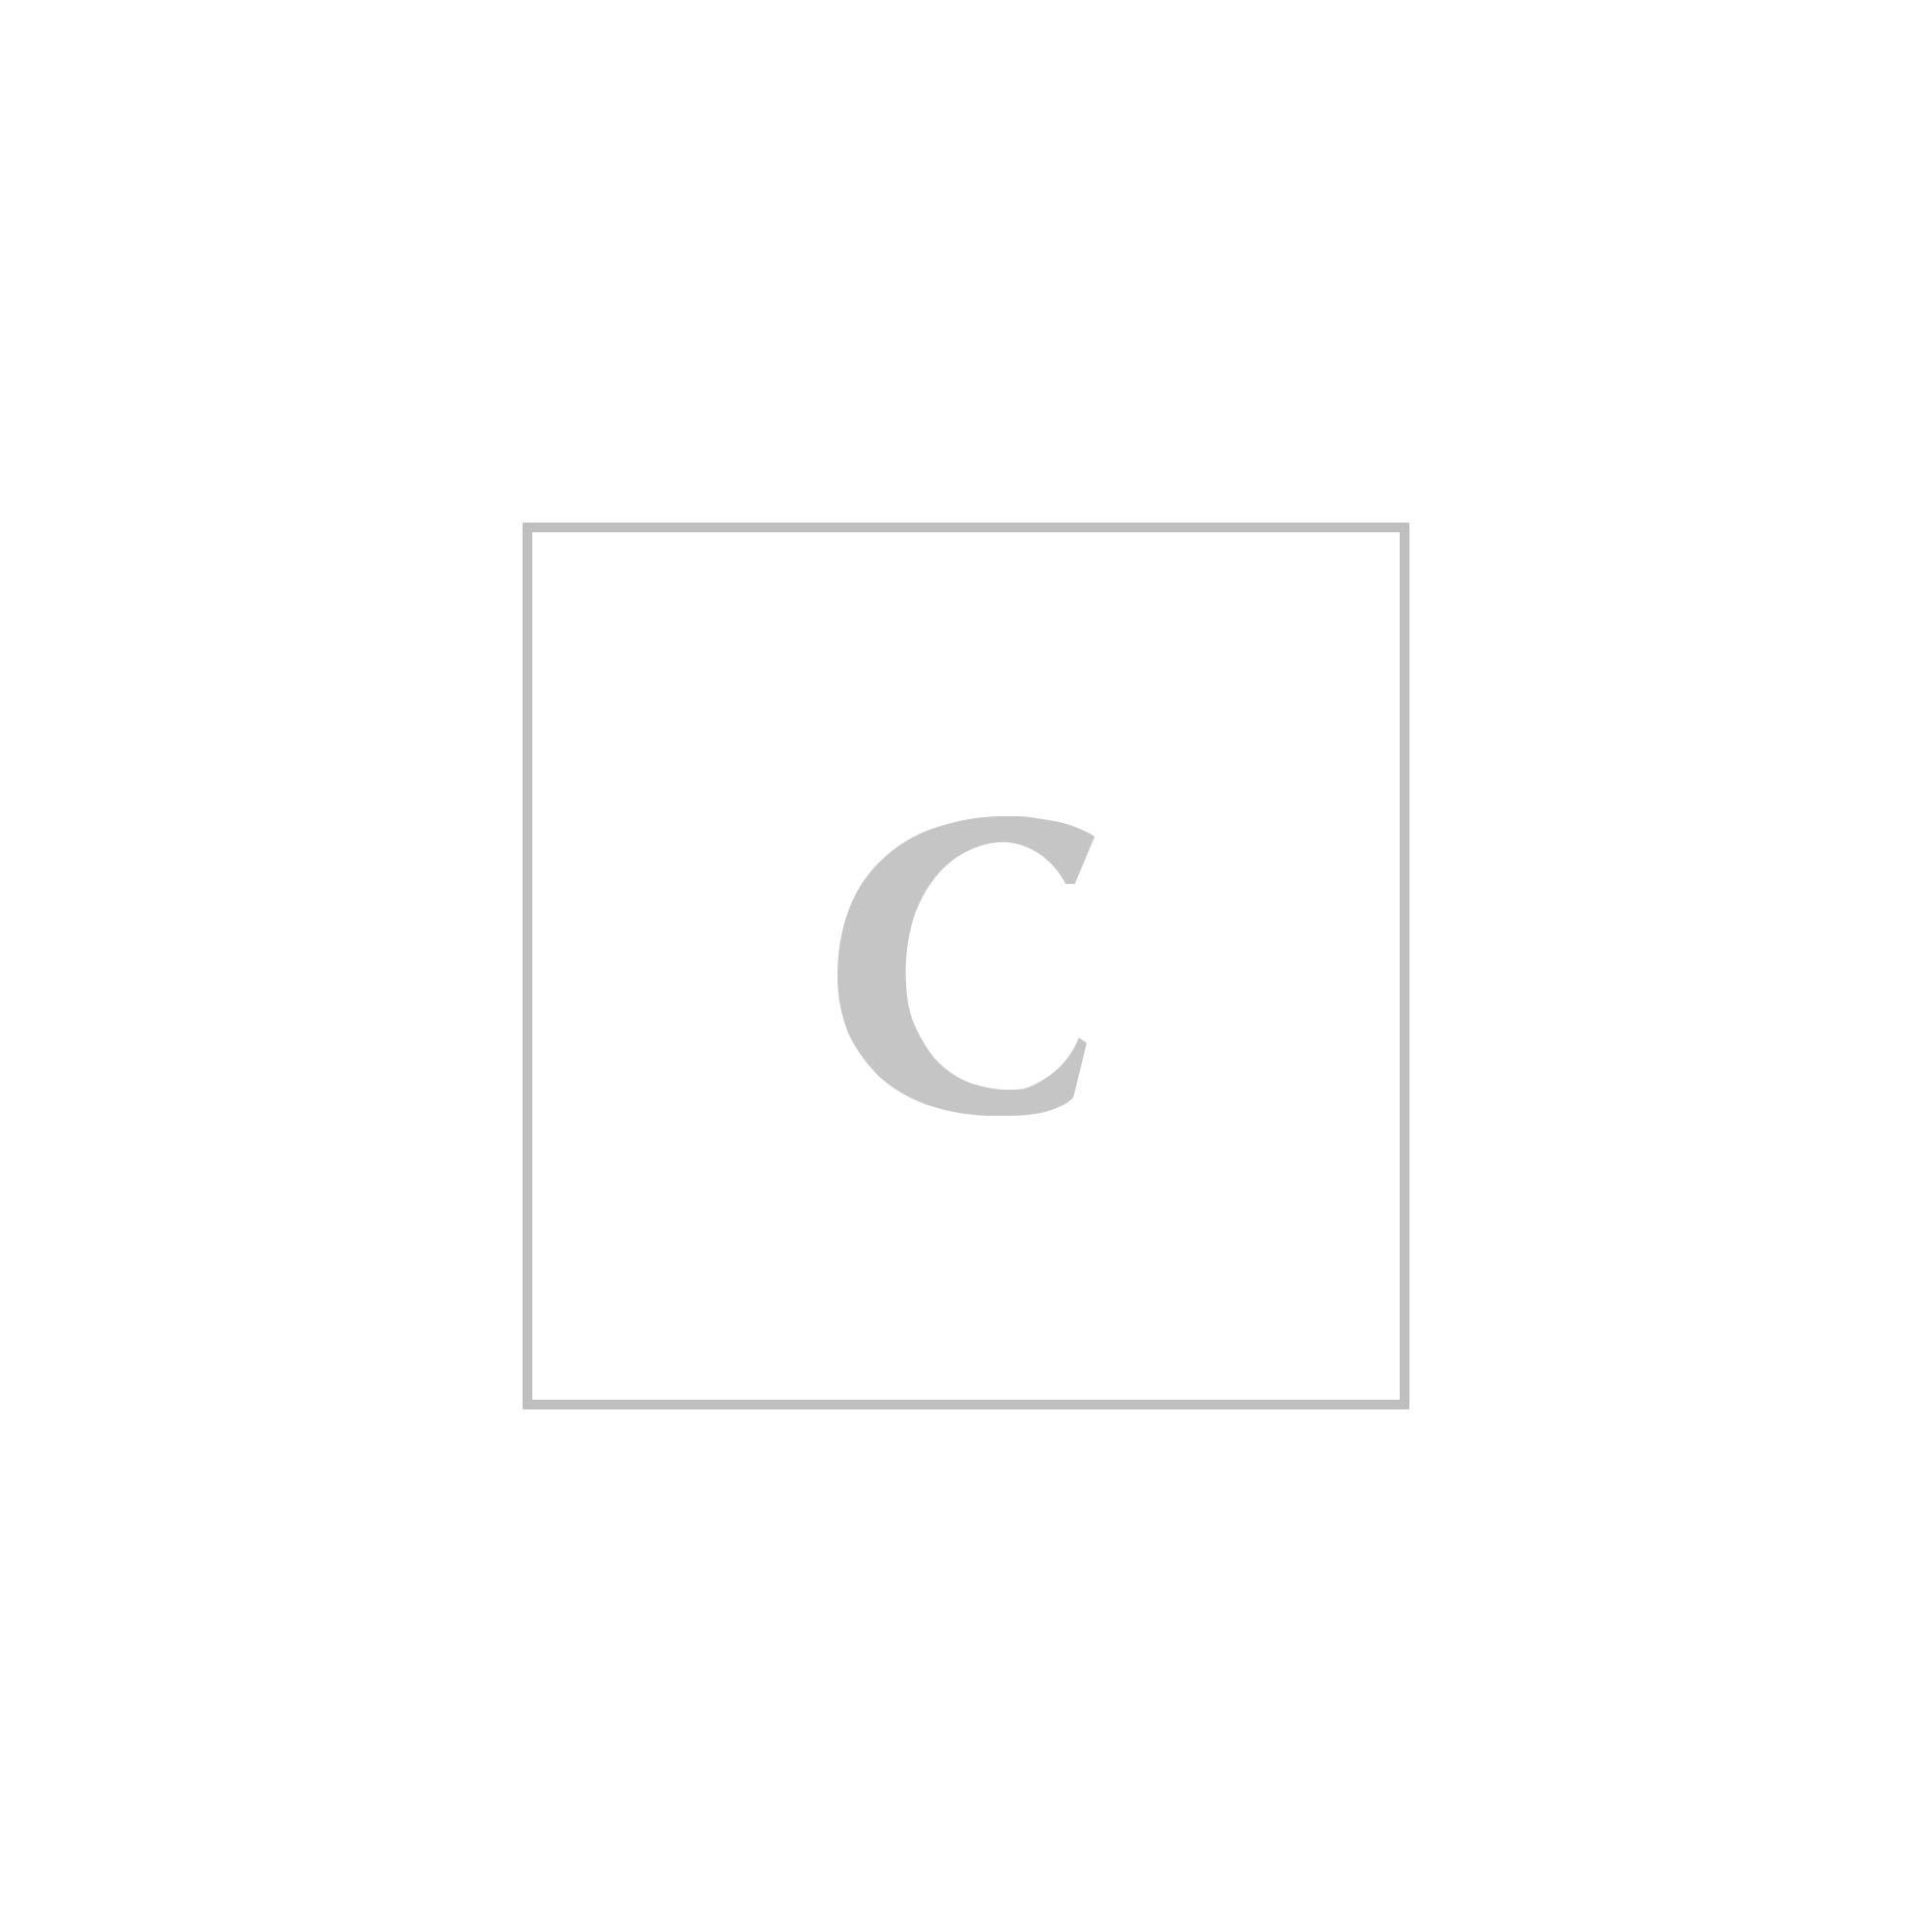 Christian Dior borsa lady dior sm cannage lambskin